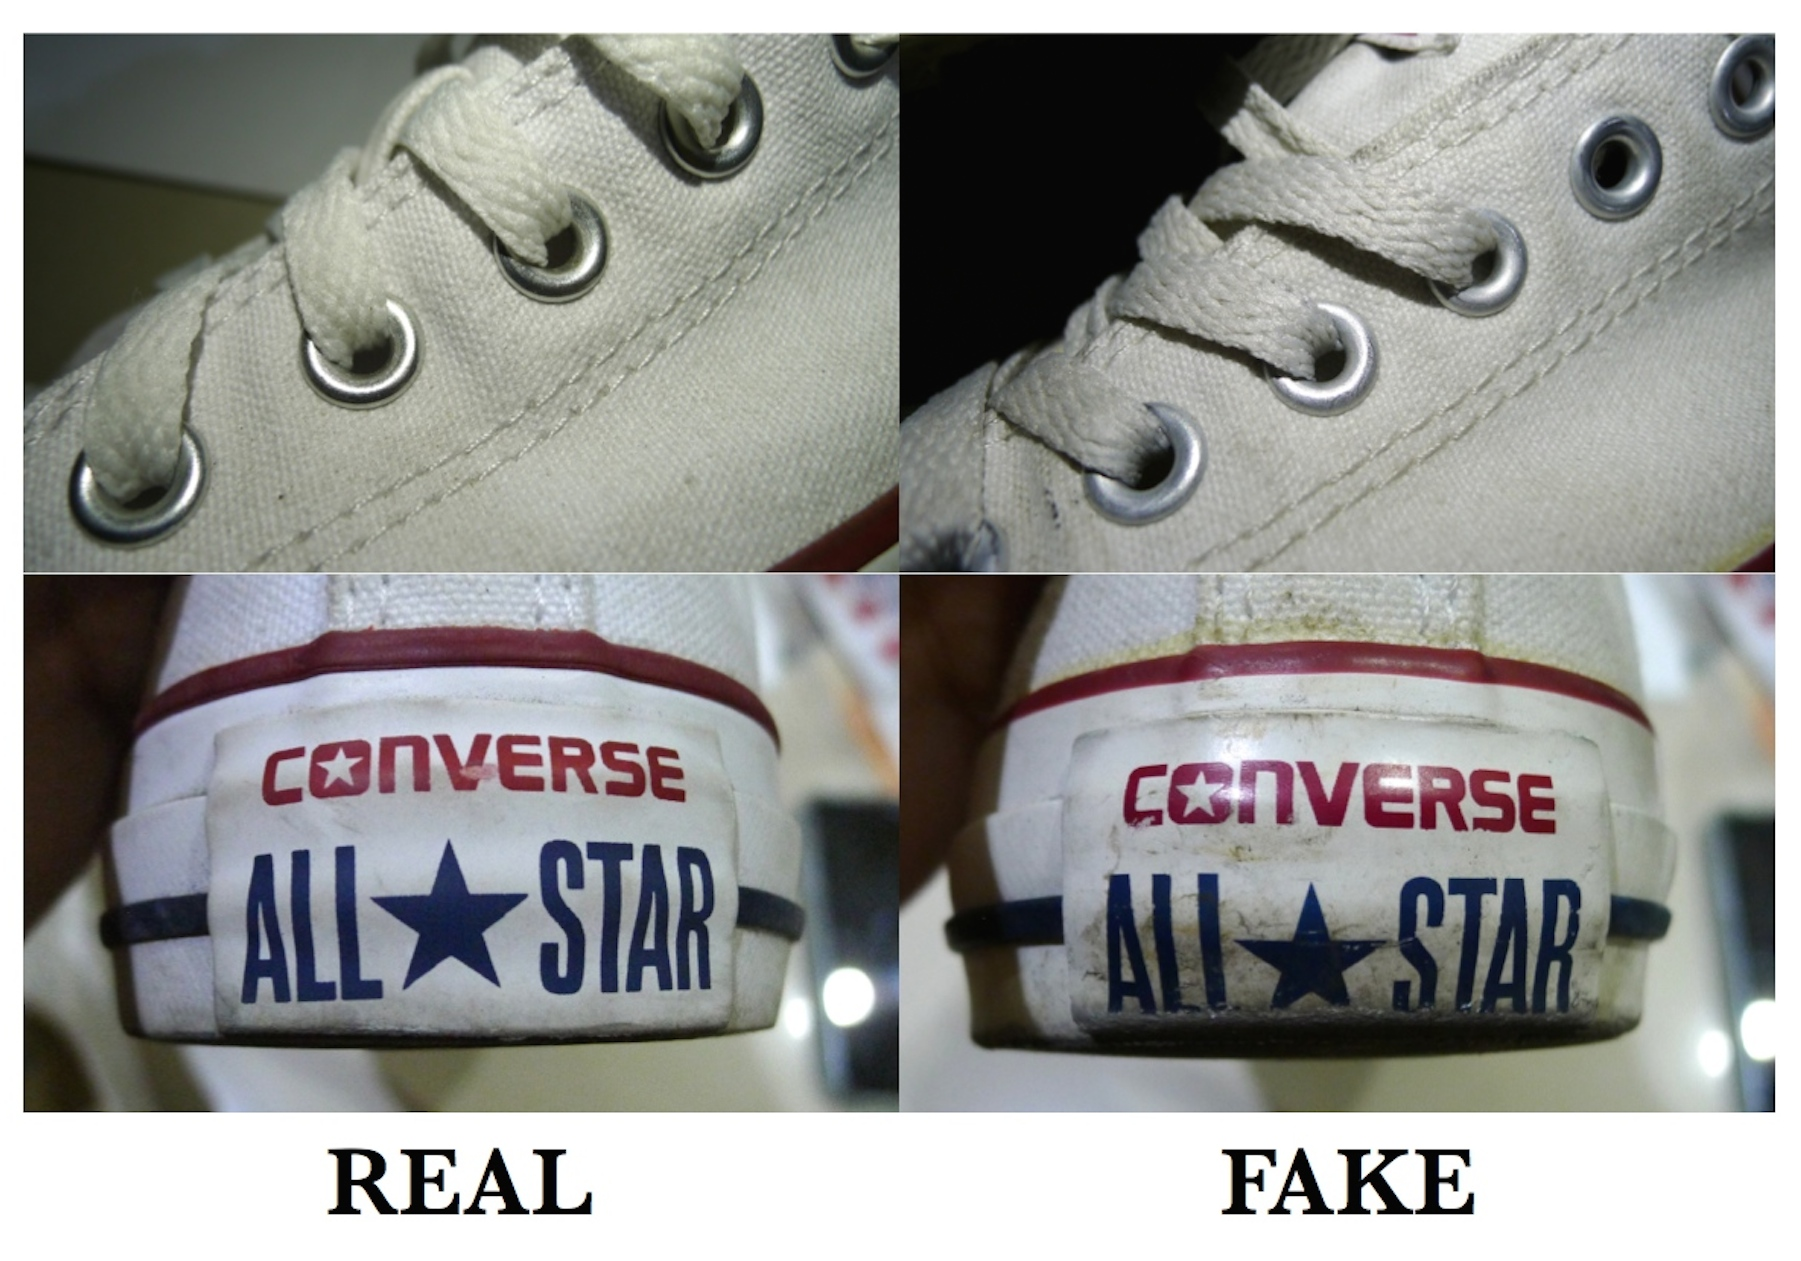 Converse All Star Made In Japan คอนเวิสที่งานดีอันดับต้นๆของโลก [Review Sneaker รีวิวรองเท้าผ้าใบ]